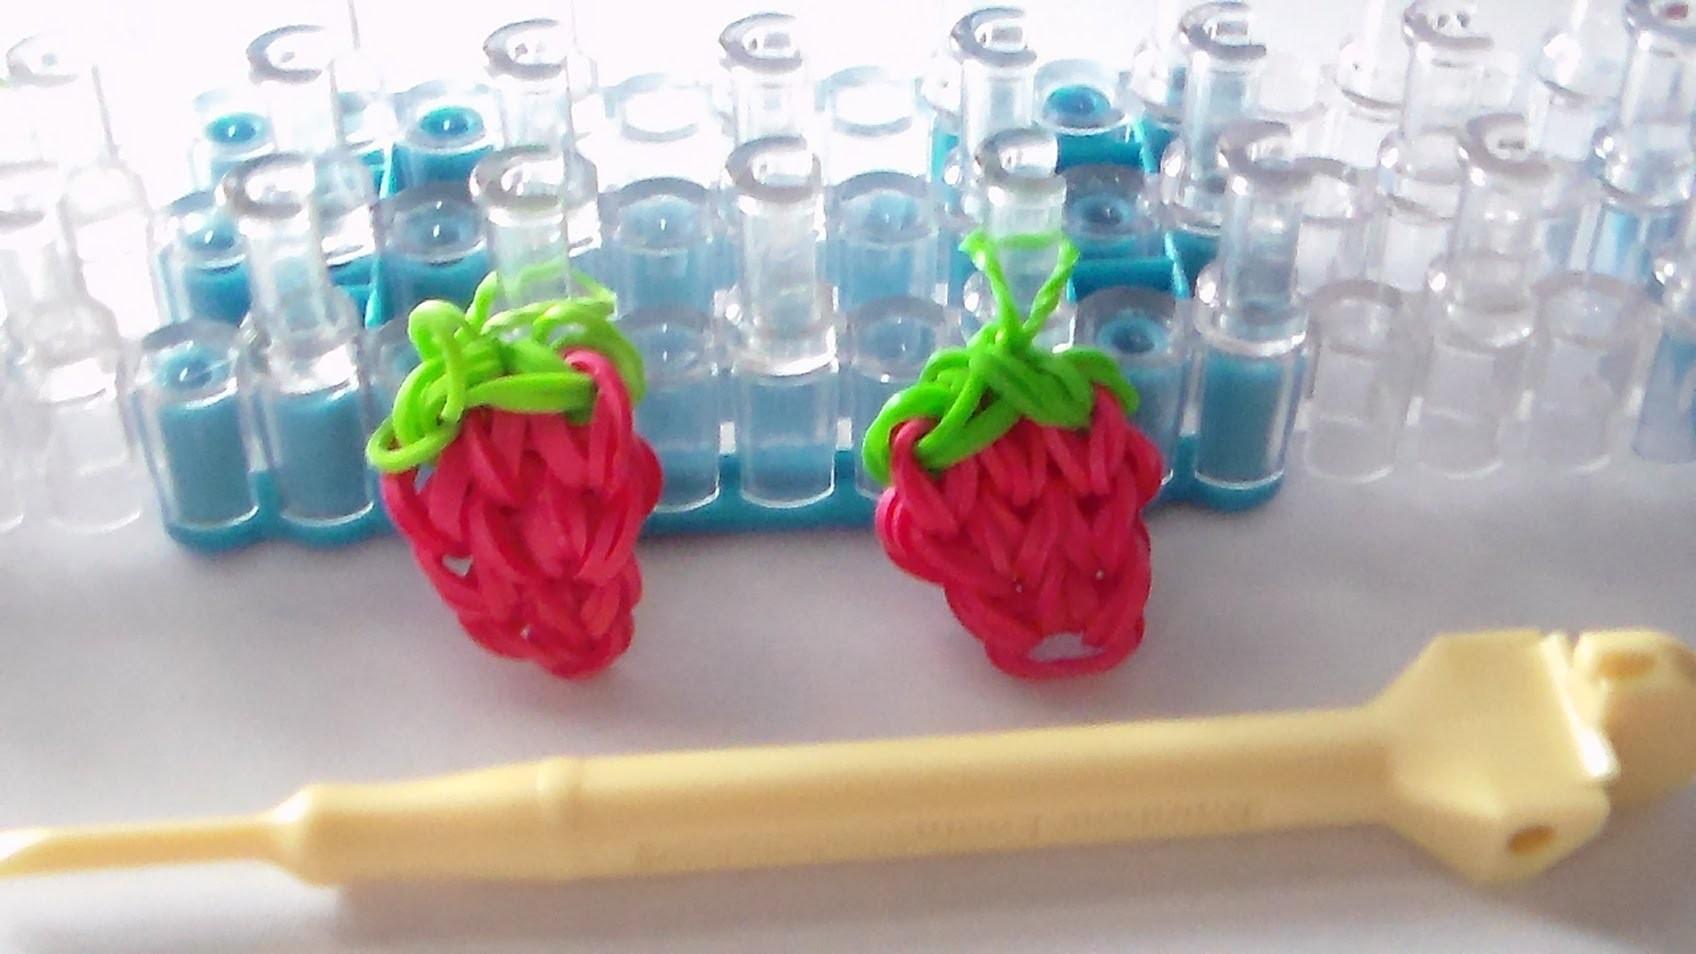 Rainbow Loom Stawberry Charm Tutorial | Como Hacer Rainbow Loom: Fresa Con Gomitas